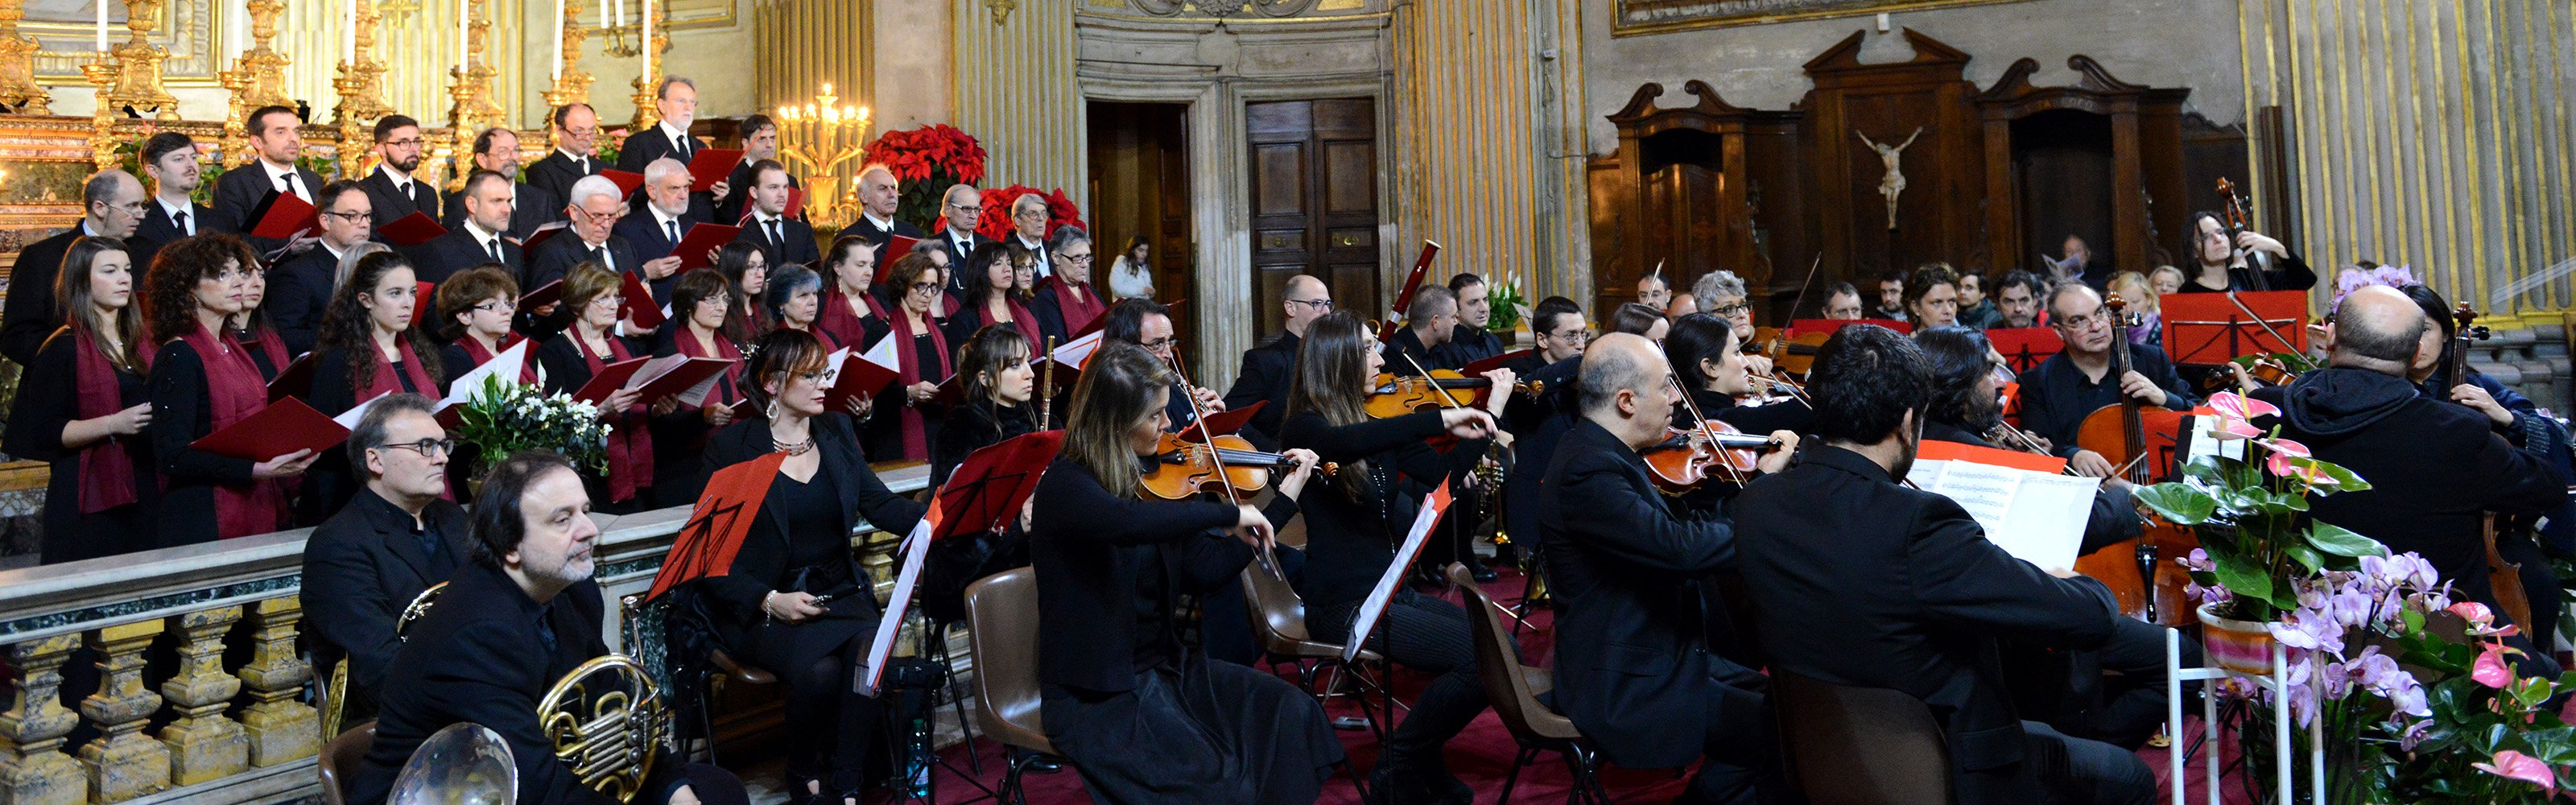 Rome Symphony Orchestra 4